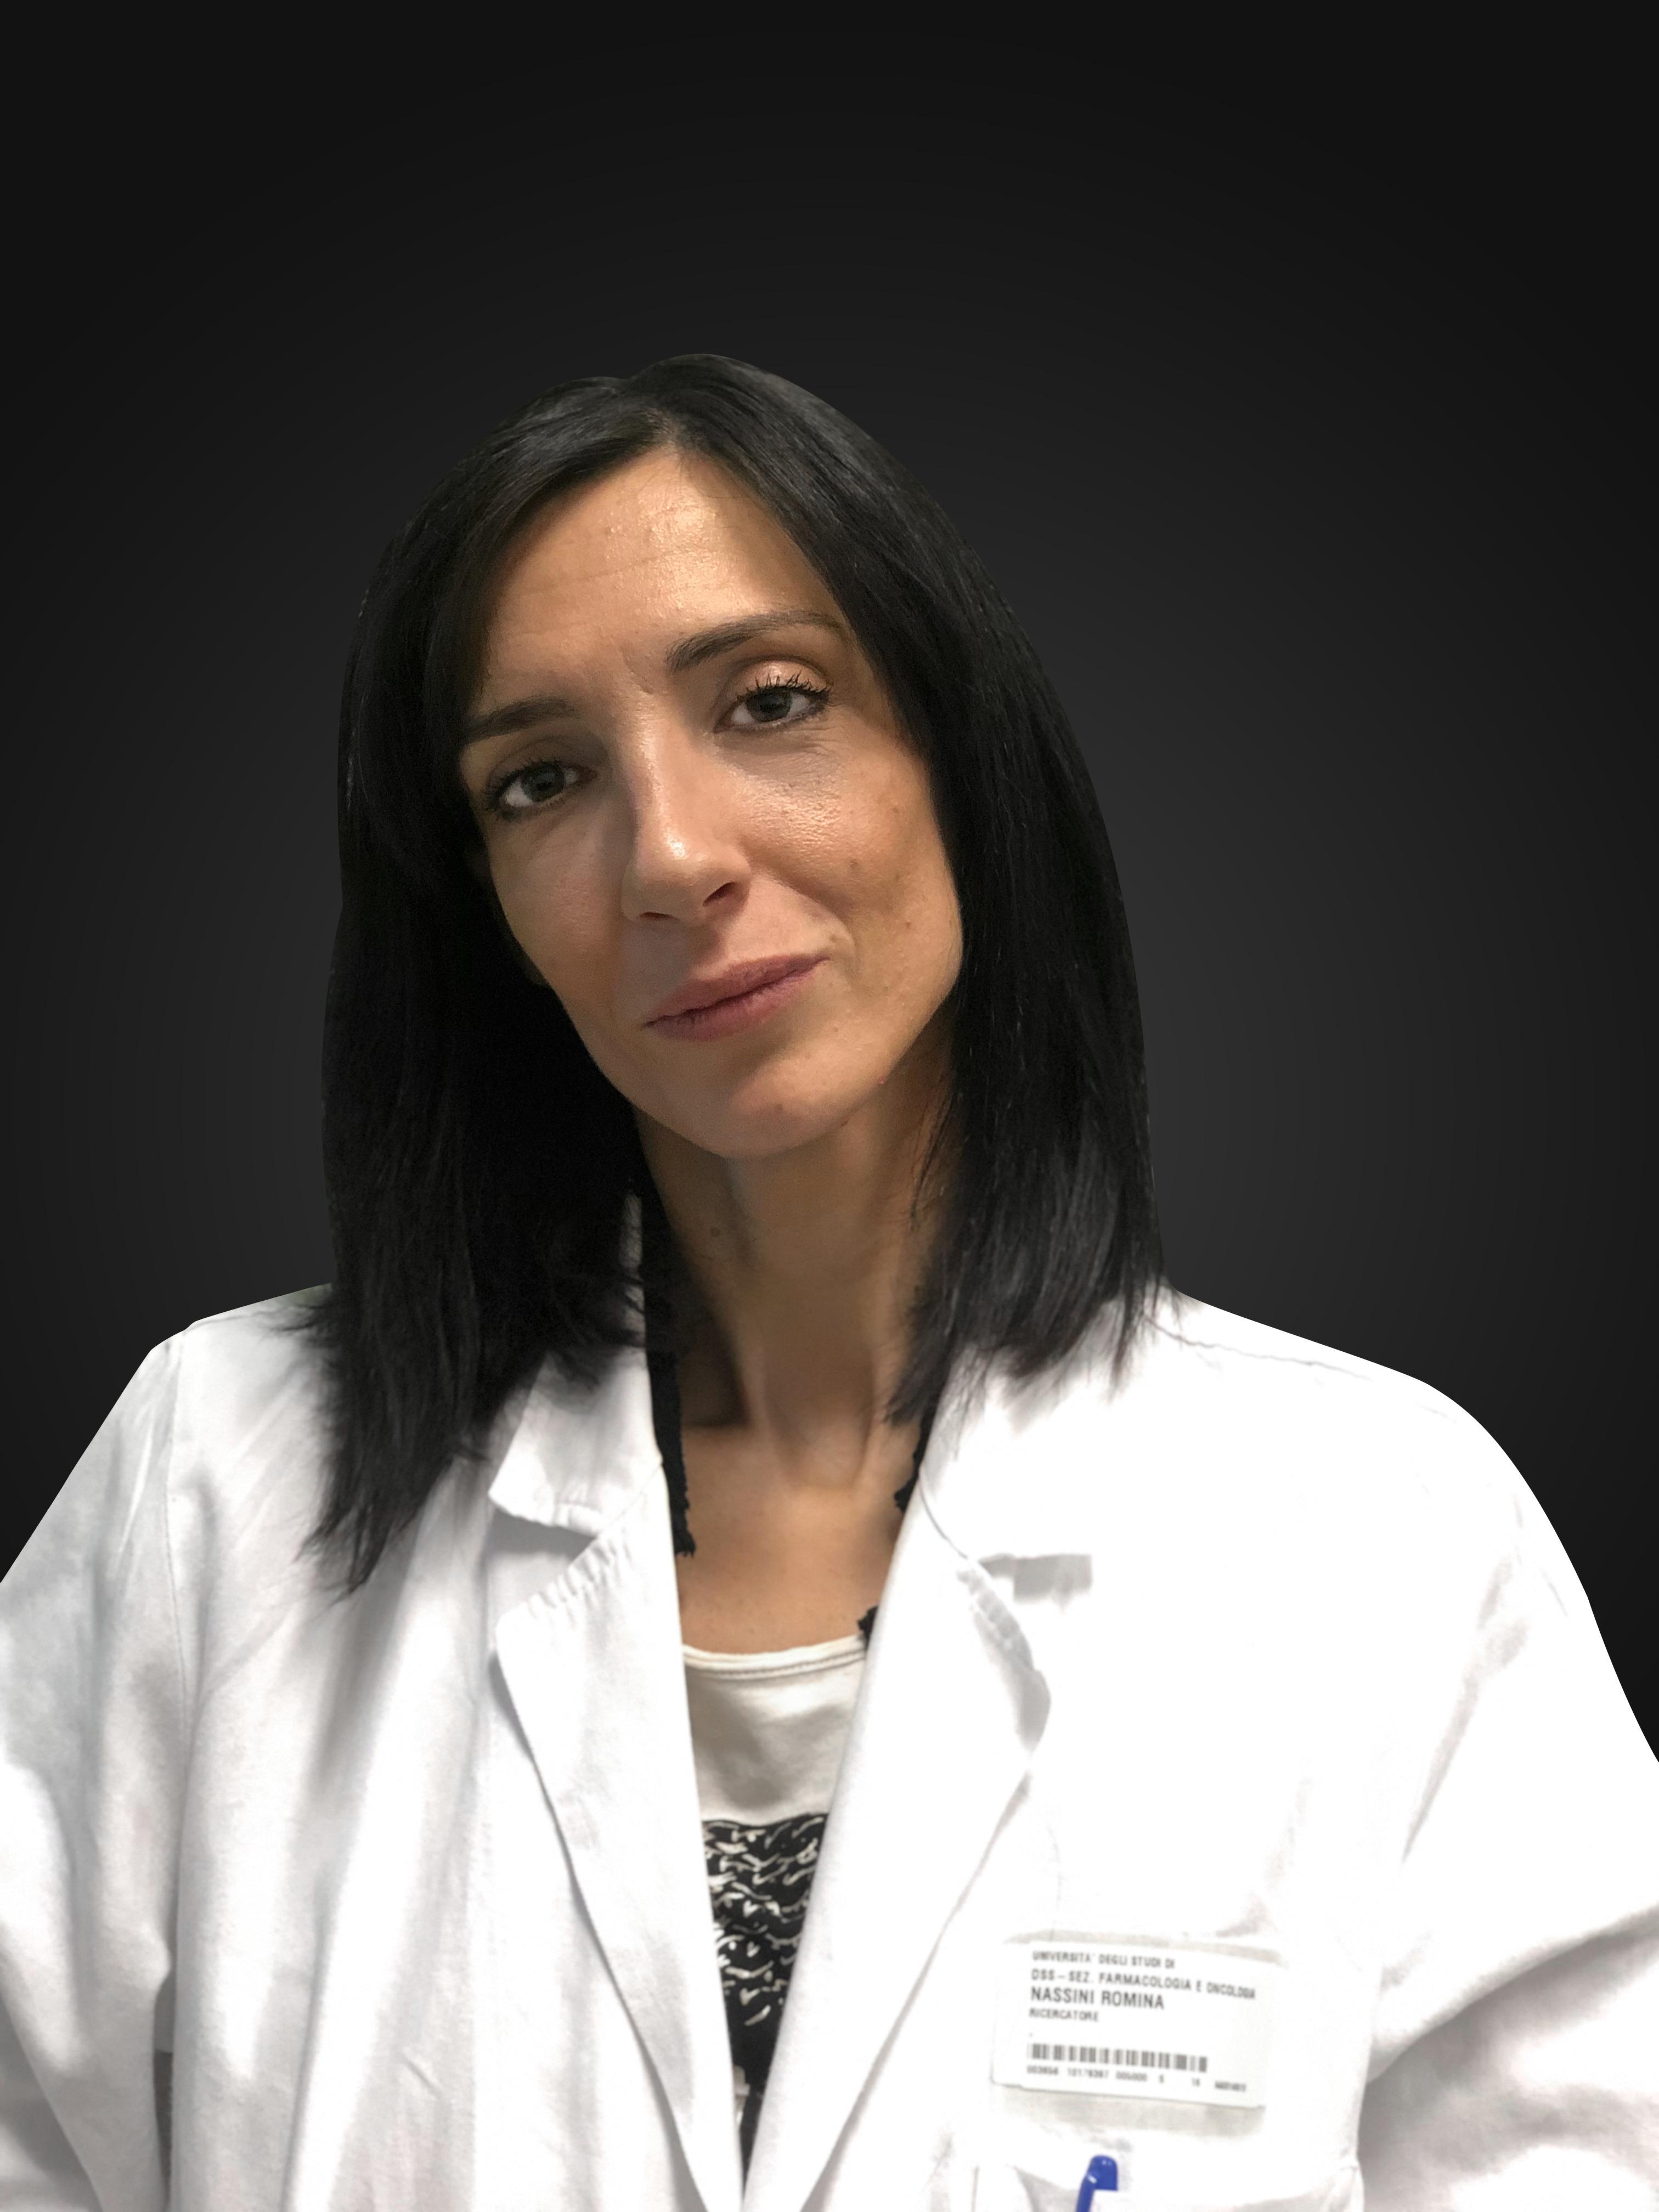 Romina Nassini